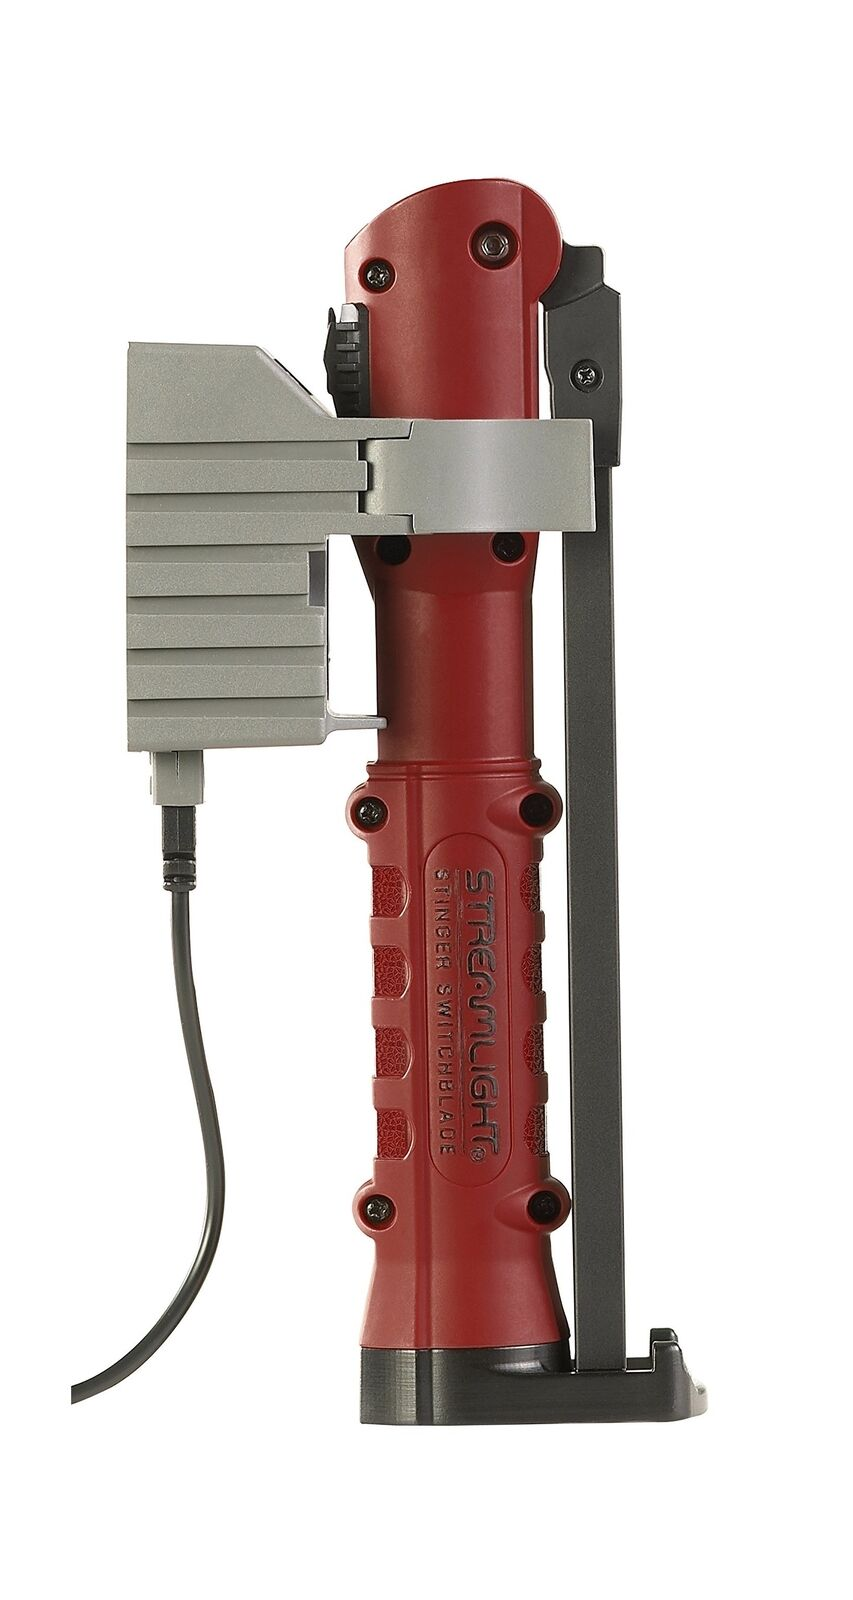 Streamlight 76800 Stinger Switchblade USB Cord ROT Flashlight - 800 Lumens